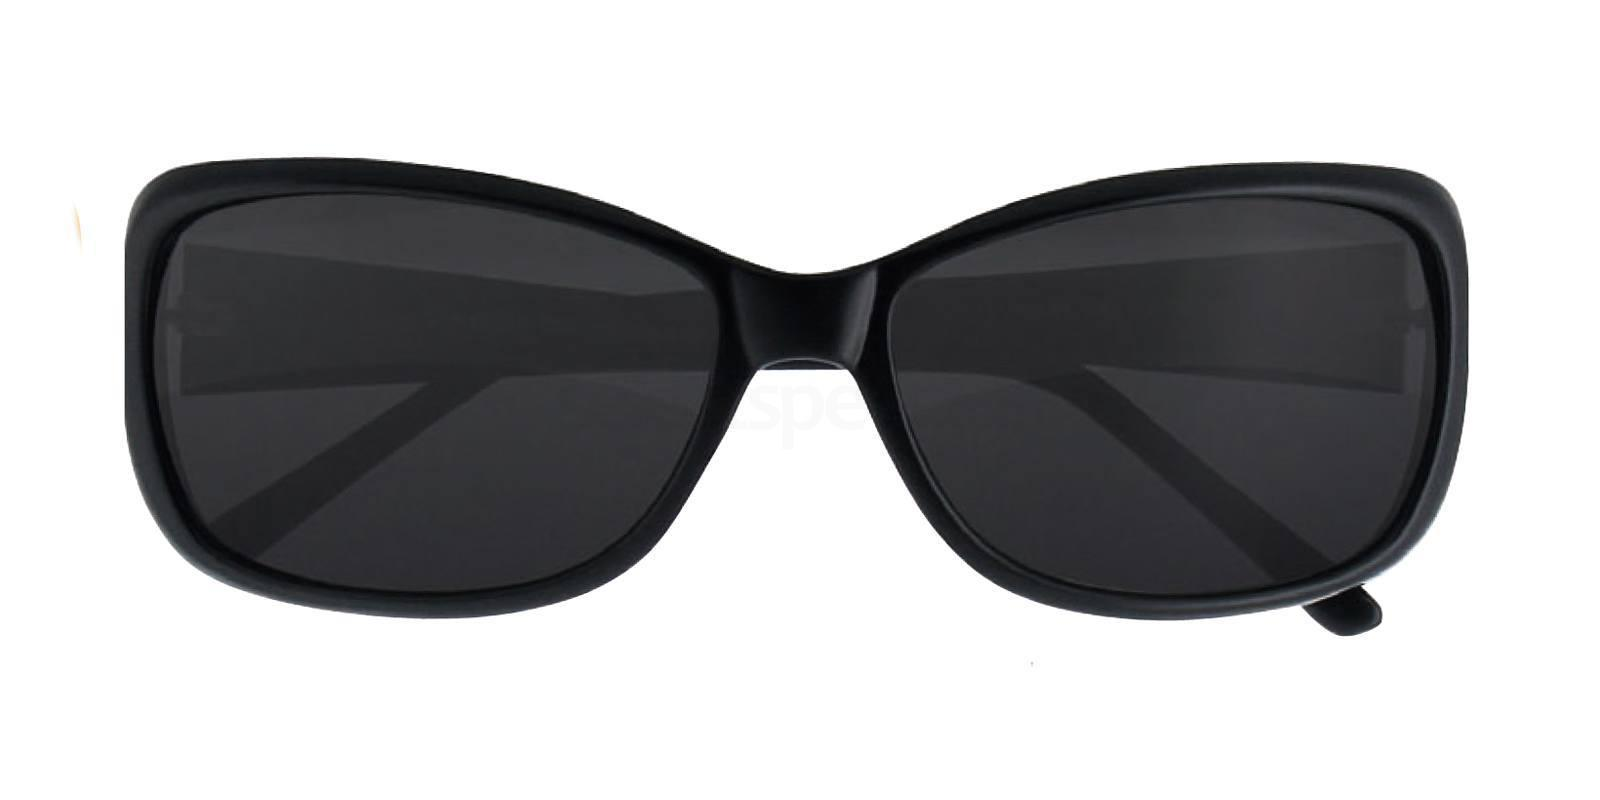 C01 OWIS127 Sunglasses, Owlet